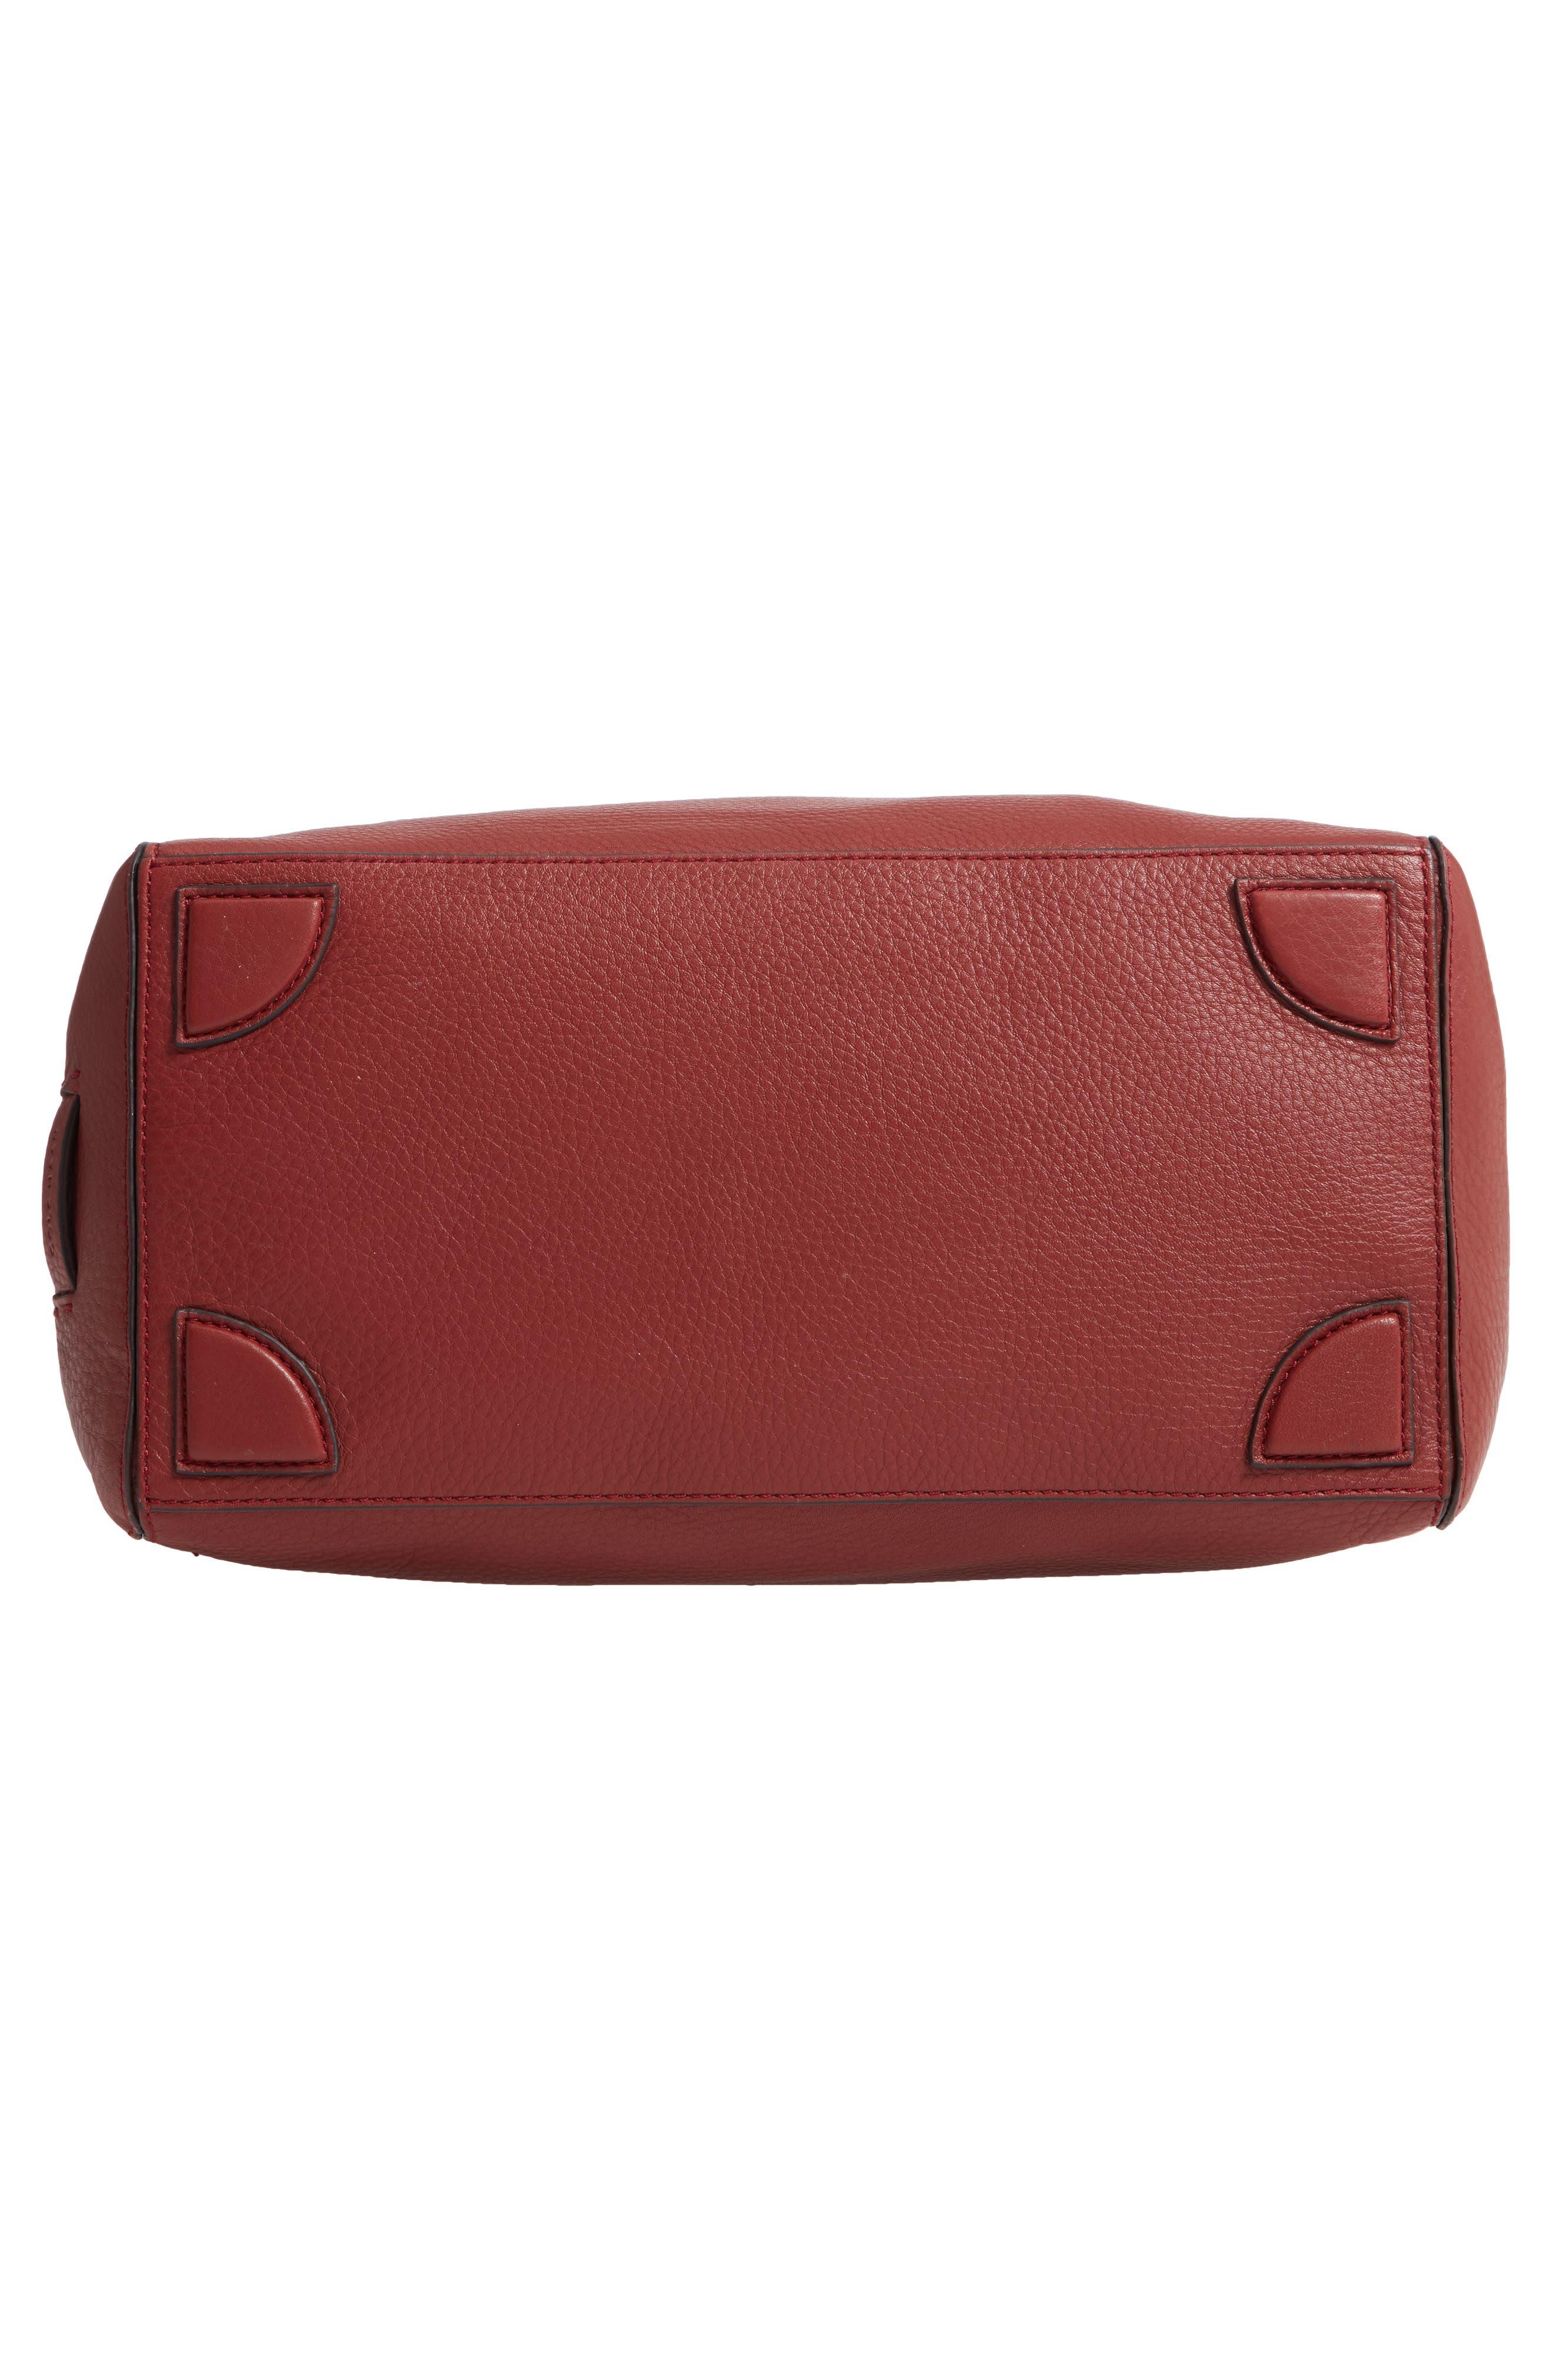 Cassidy RFID Pebbled Leather Bucket Bag,                             Alternate thumbnail 22, color,